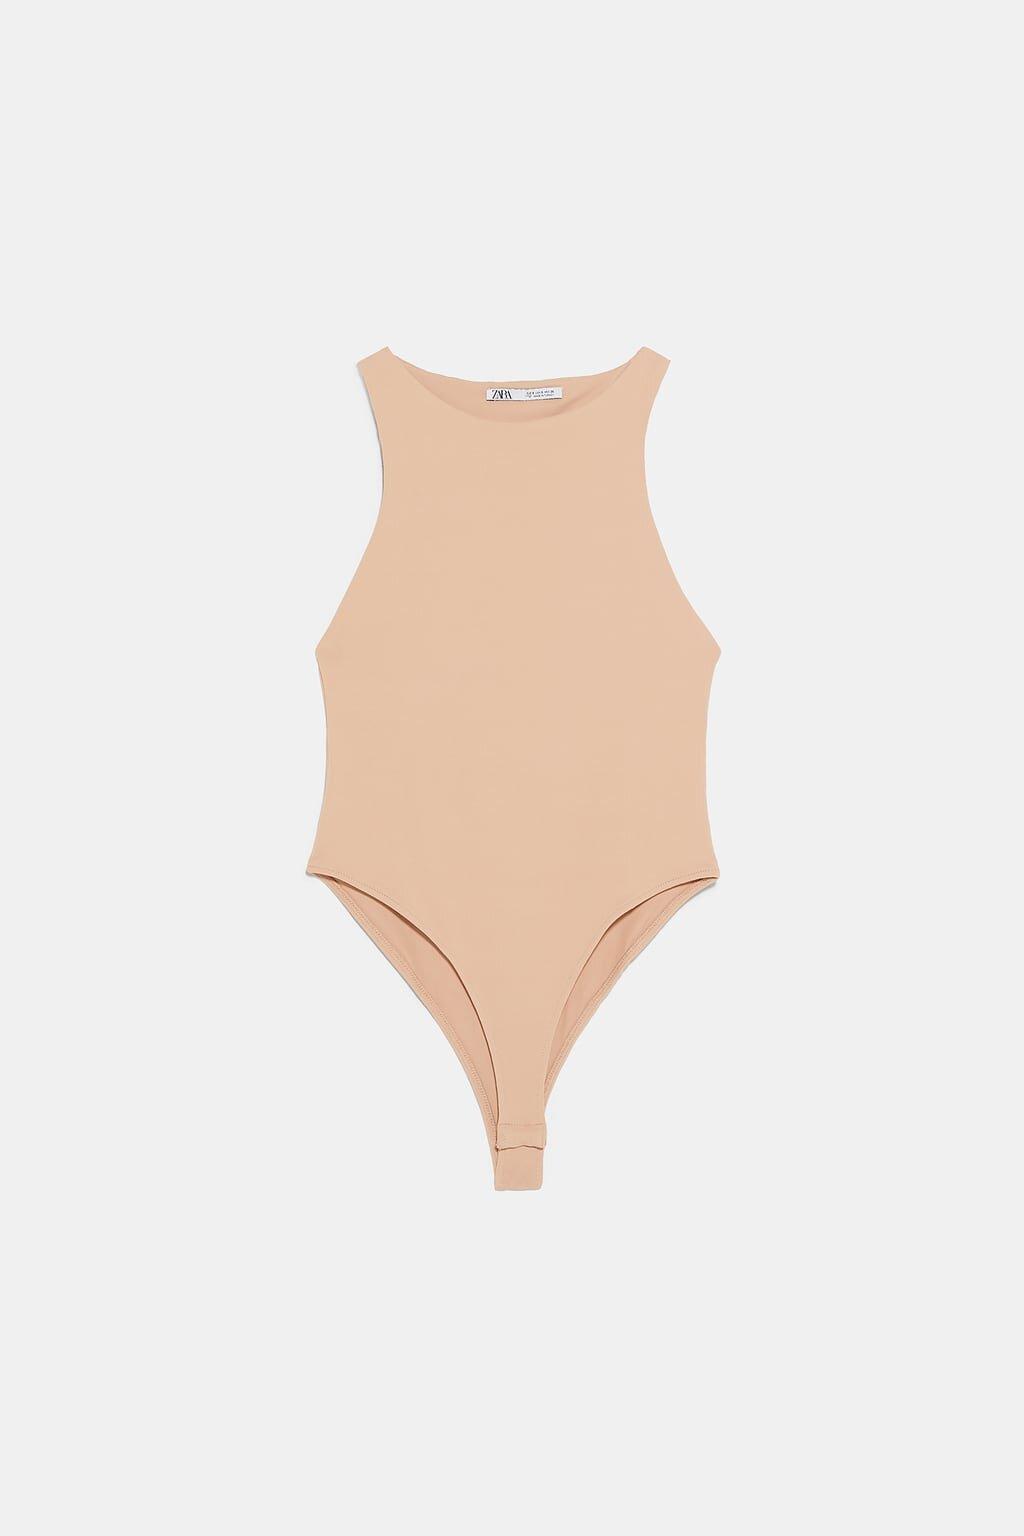 Zara Halter Bodysuit in Beige: $20